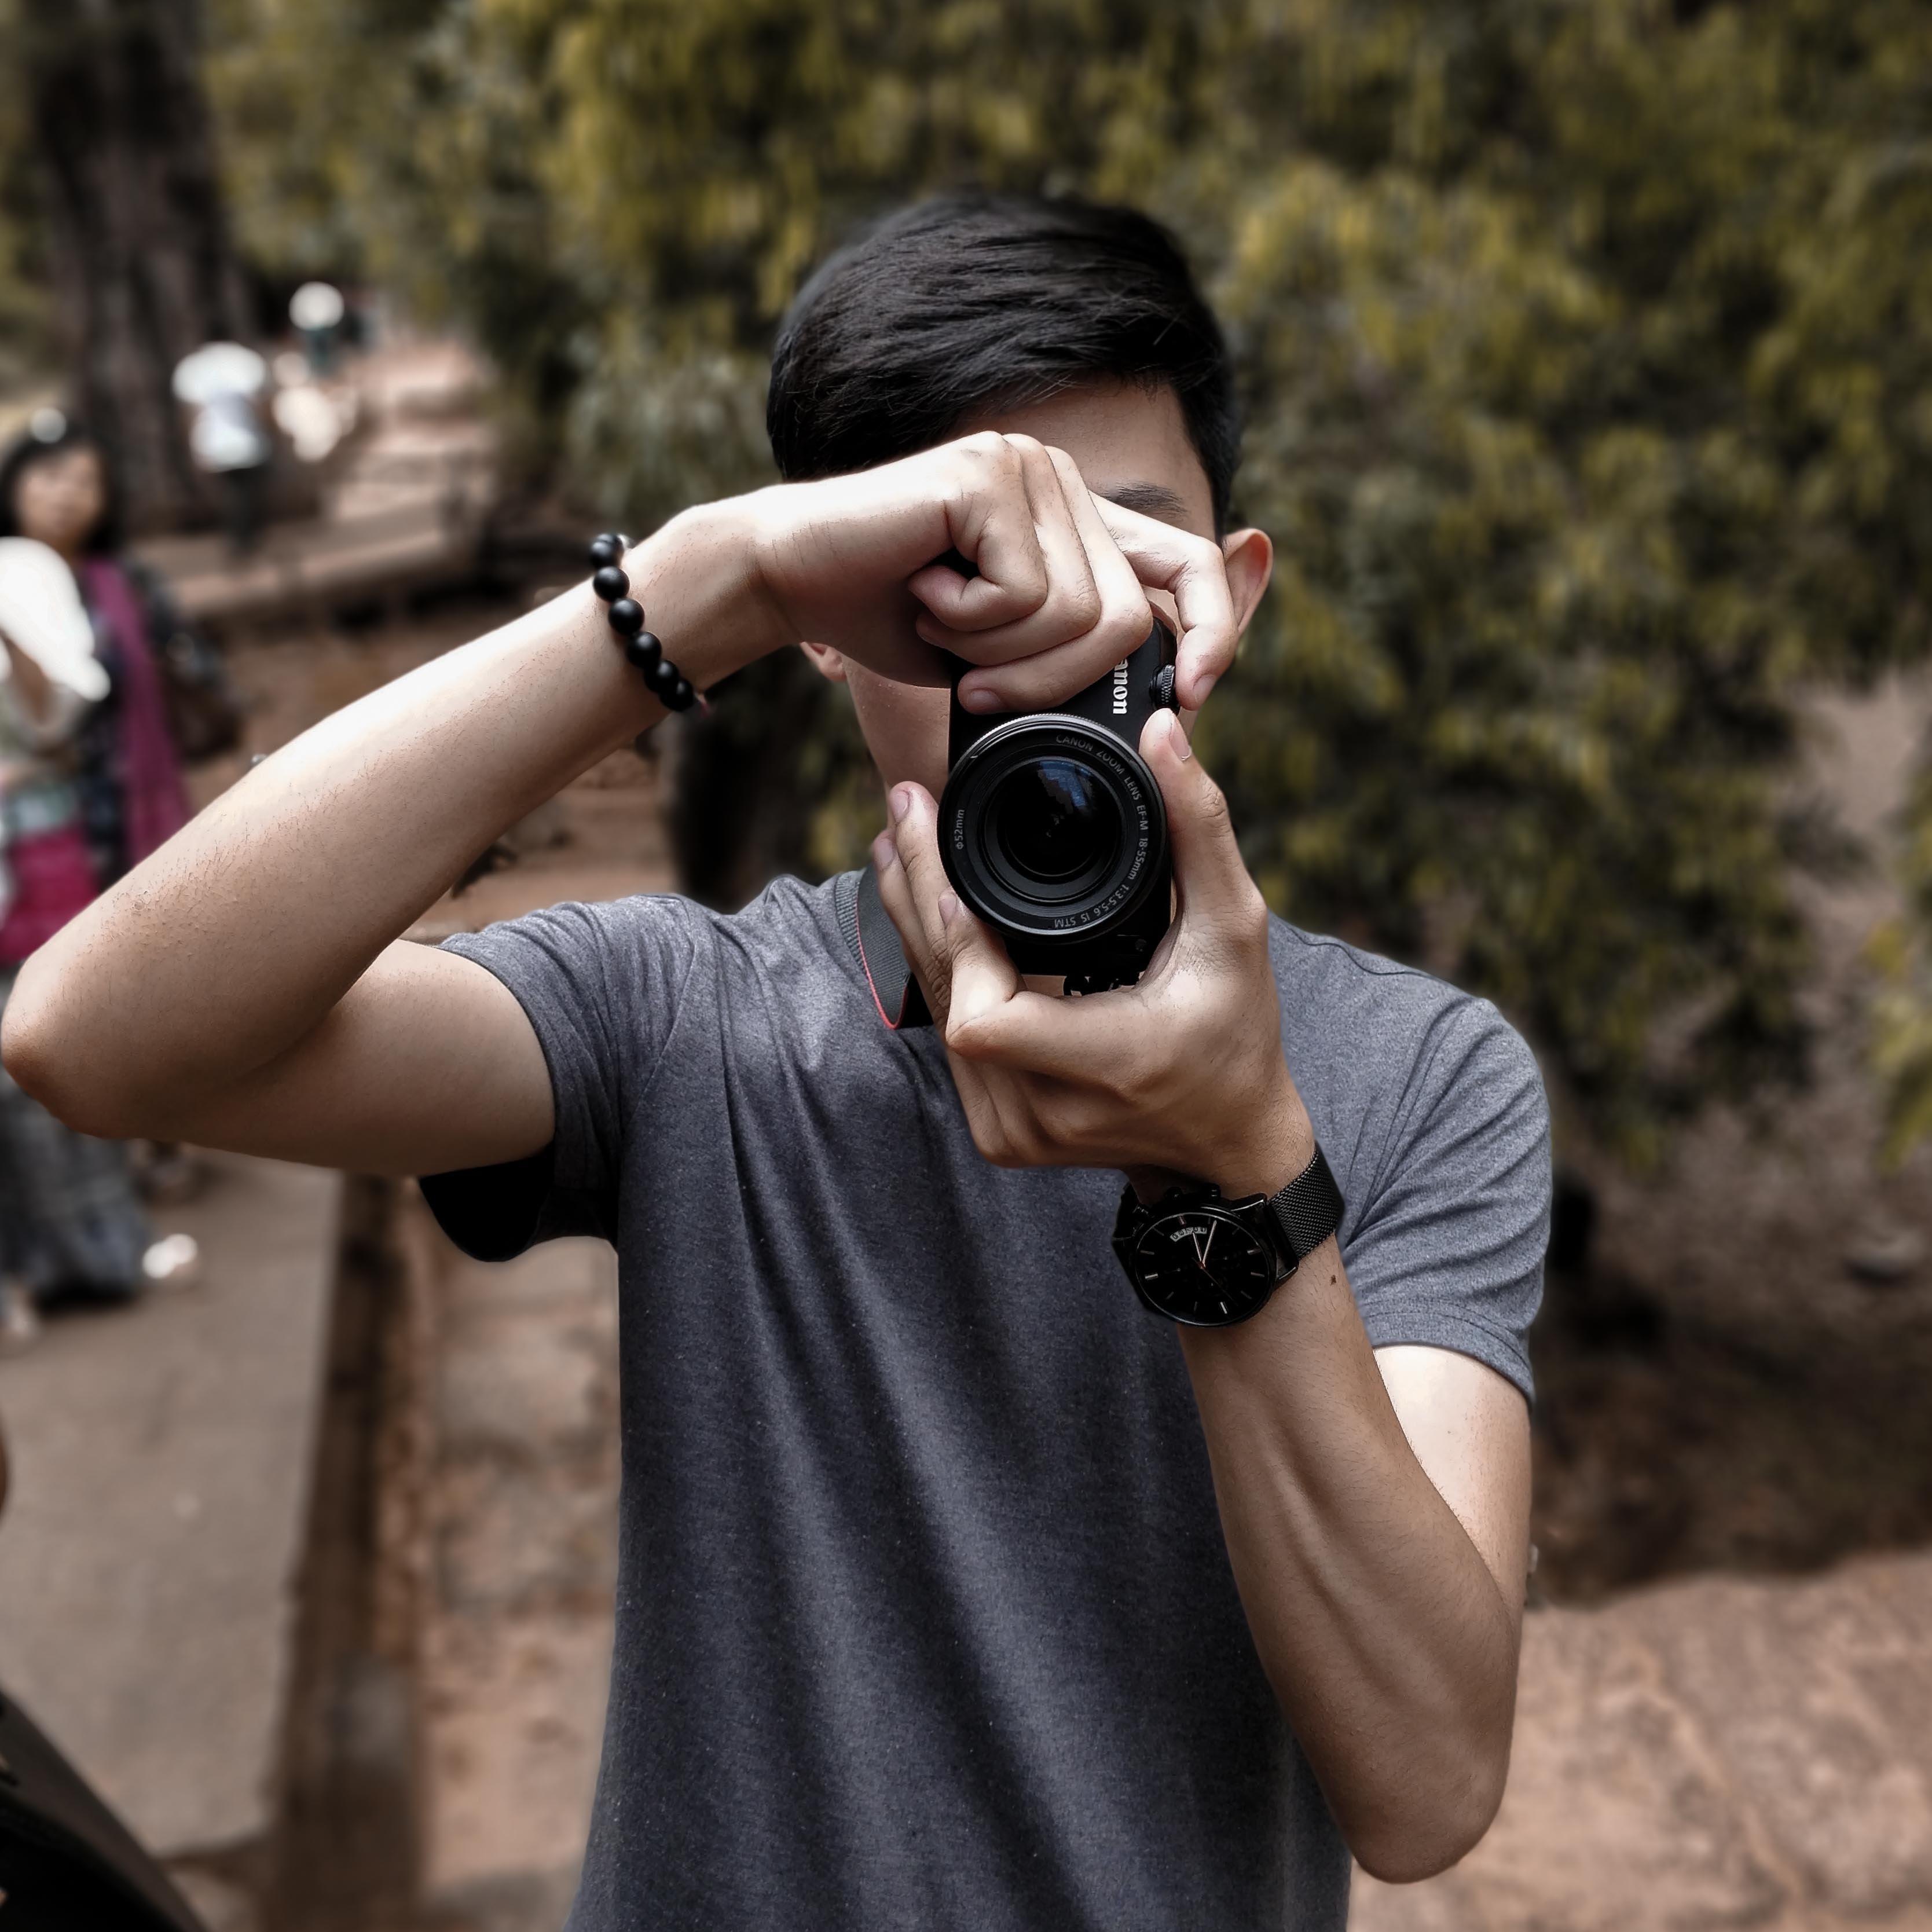 Go to Senghak Lee's profile